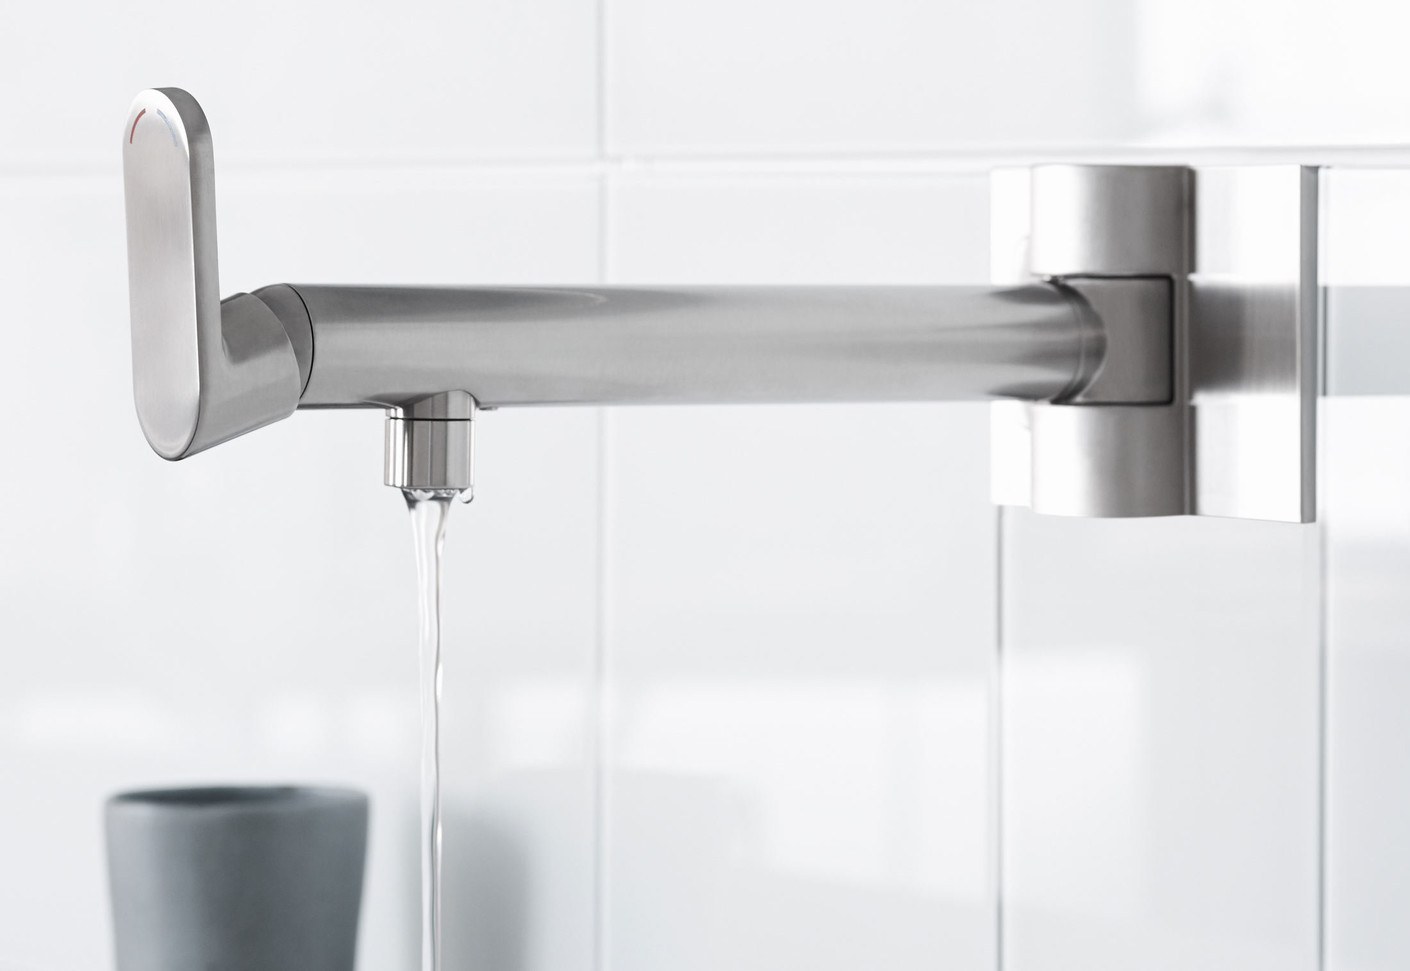 bulthaup mixer faucet by bulthaup